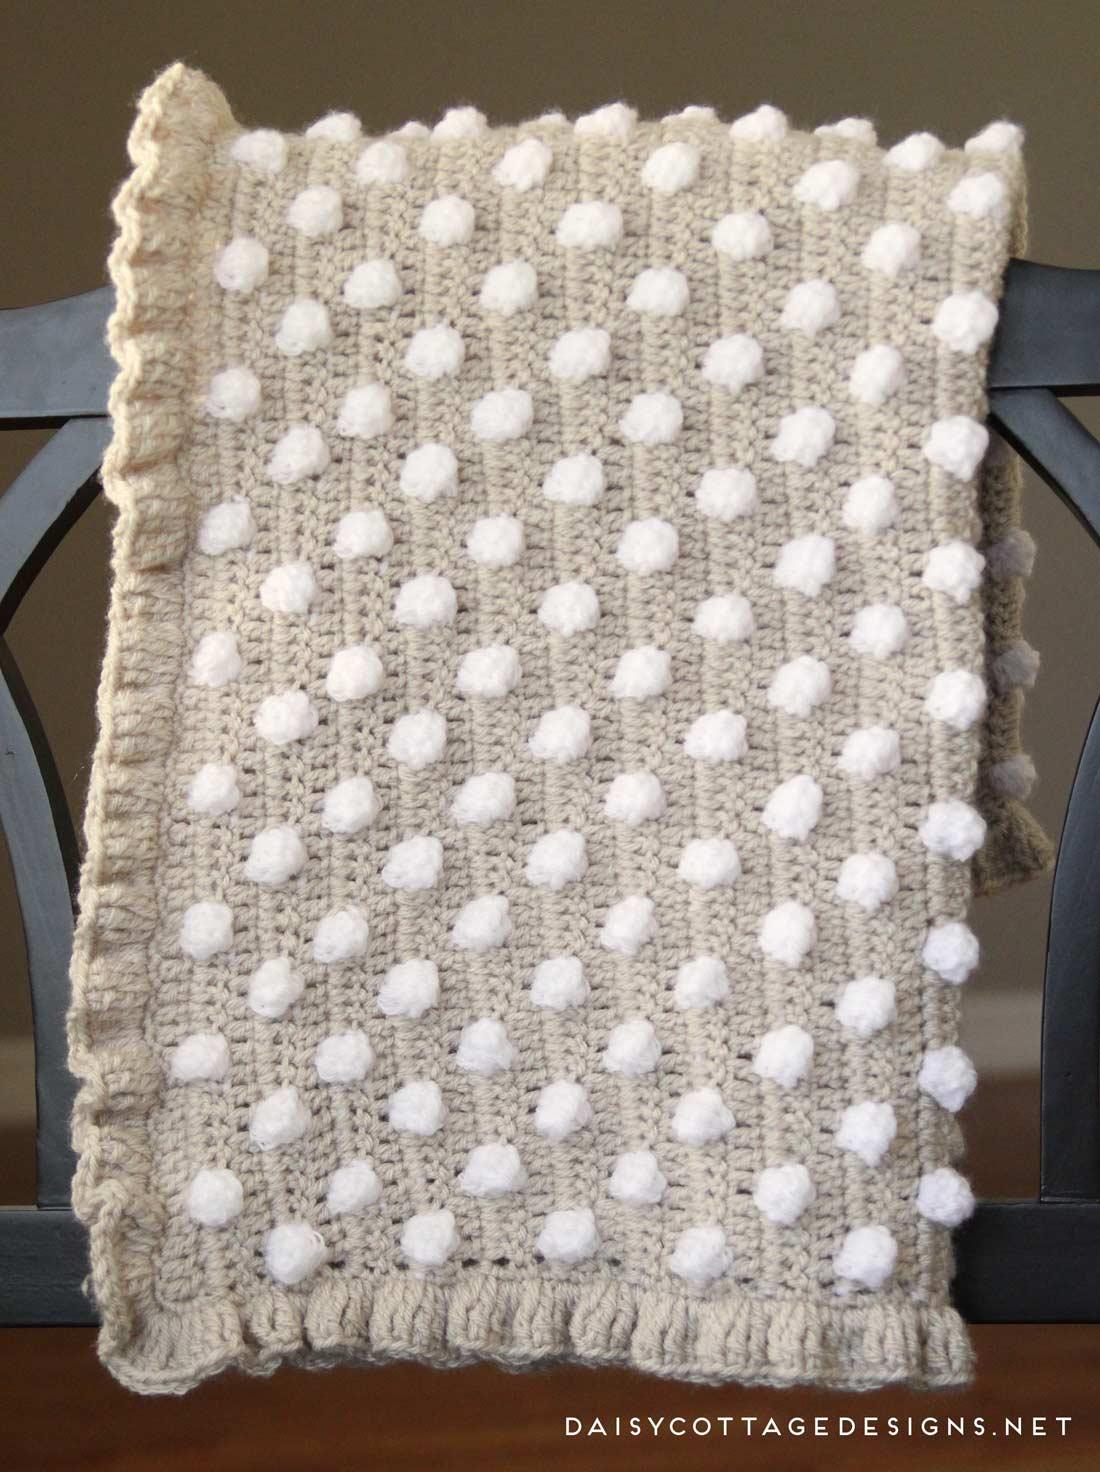 free crochet pattern | crochet blanket pattern | crochet baby blanket |  polkadot blanket CXOFKRD